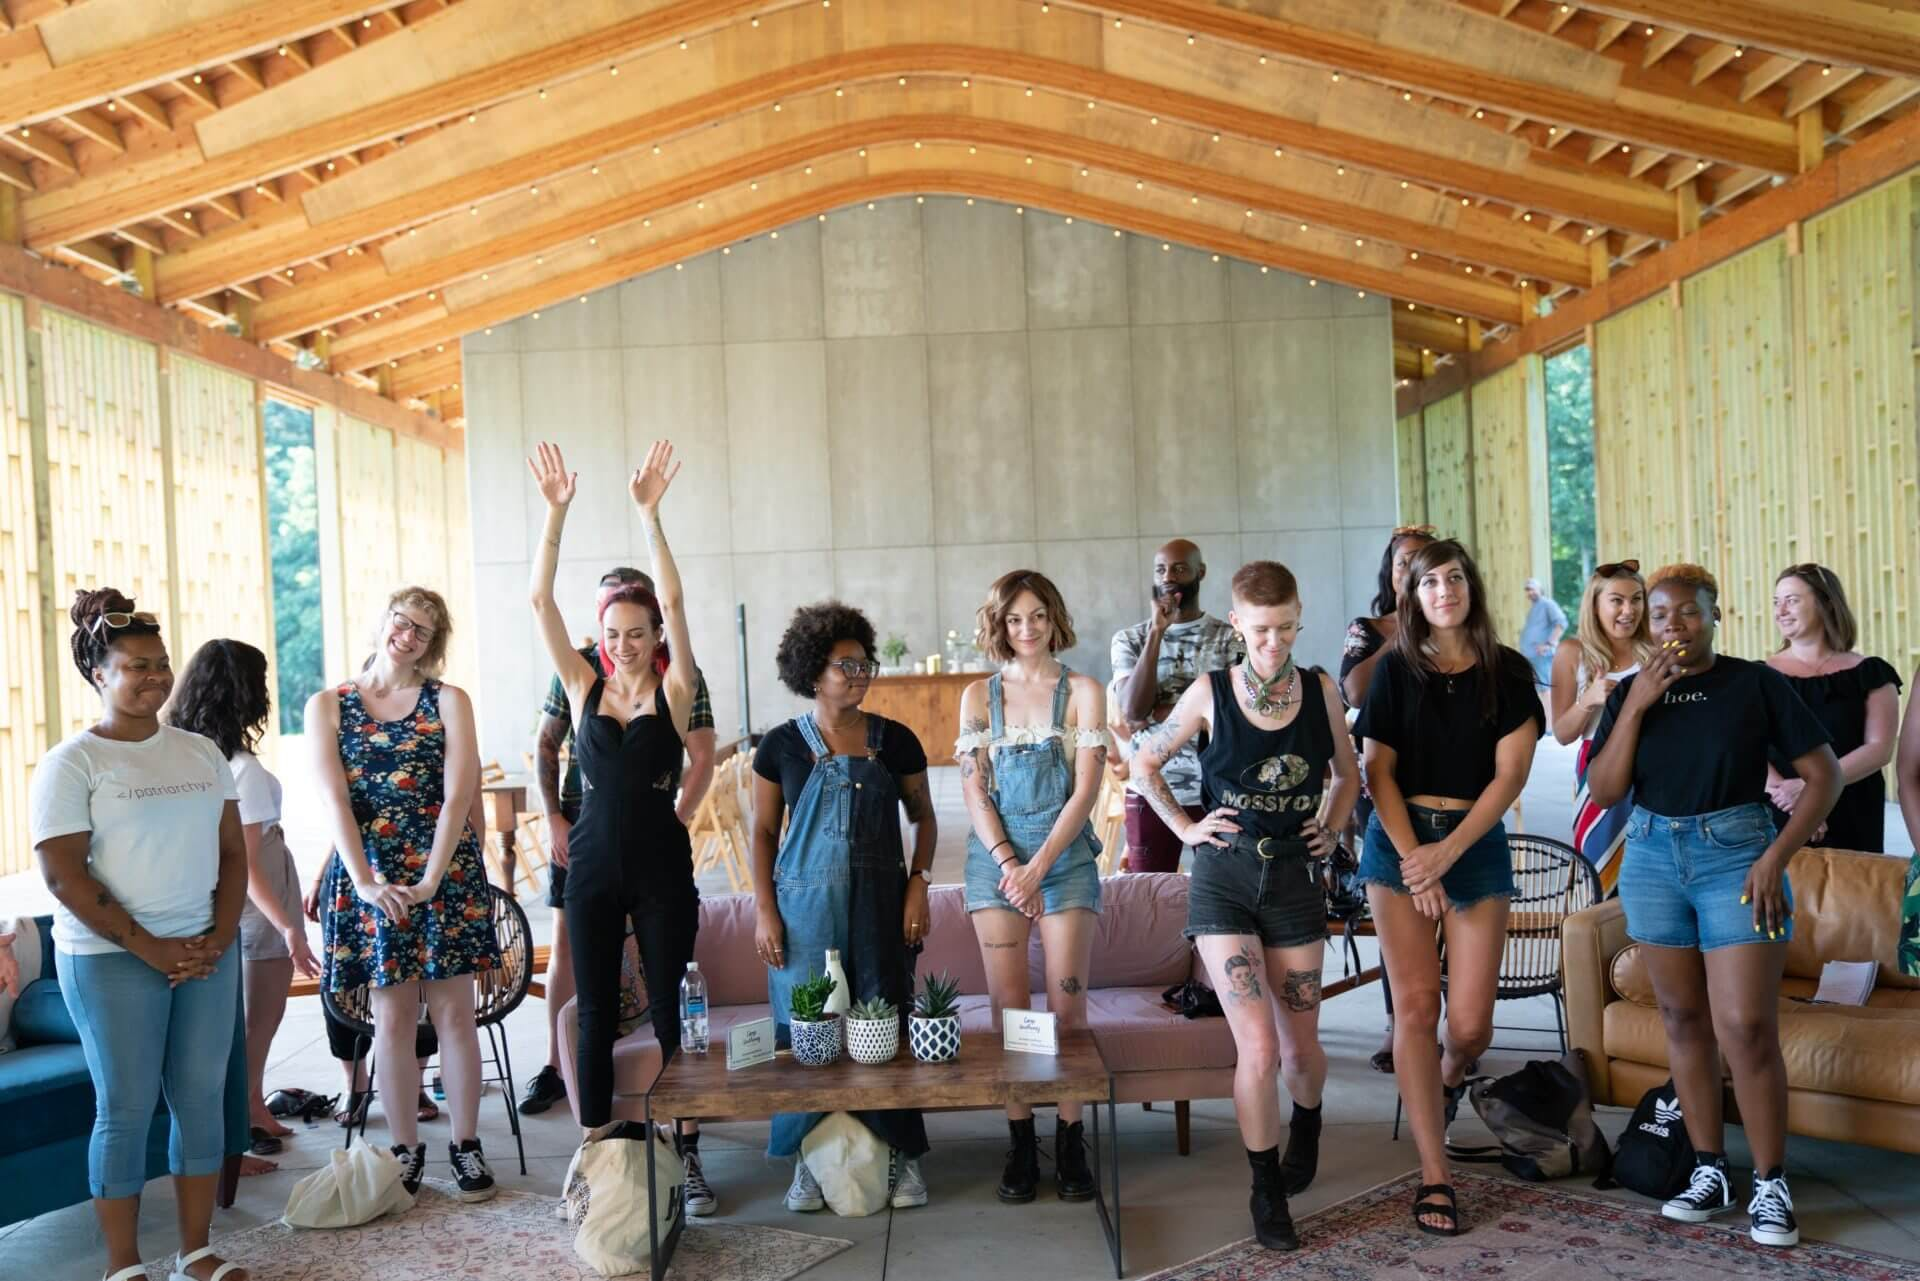 Inclusive Sex Education Camp Lovehoney